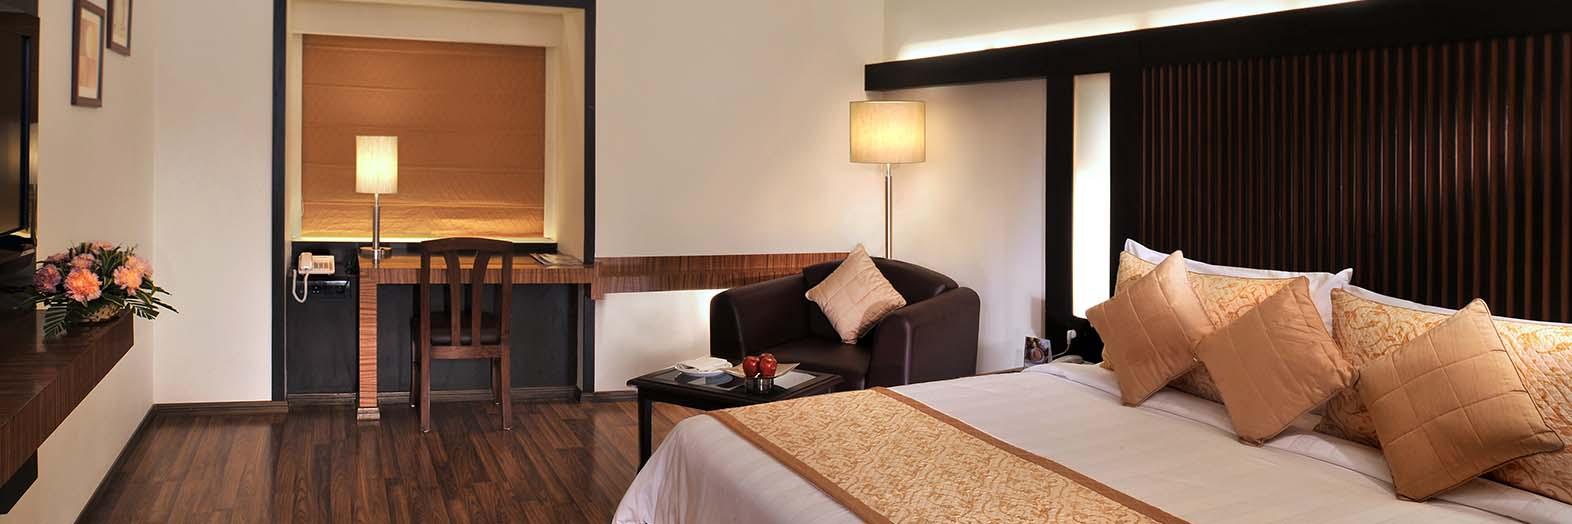 Fortune Inn Haveli, Gandhinagar Hotels